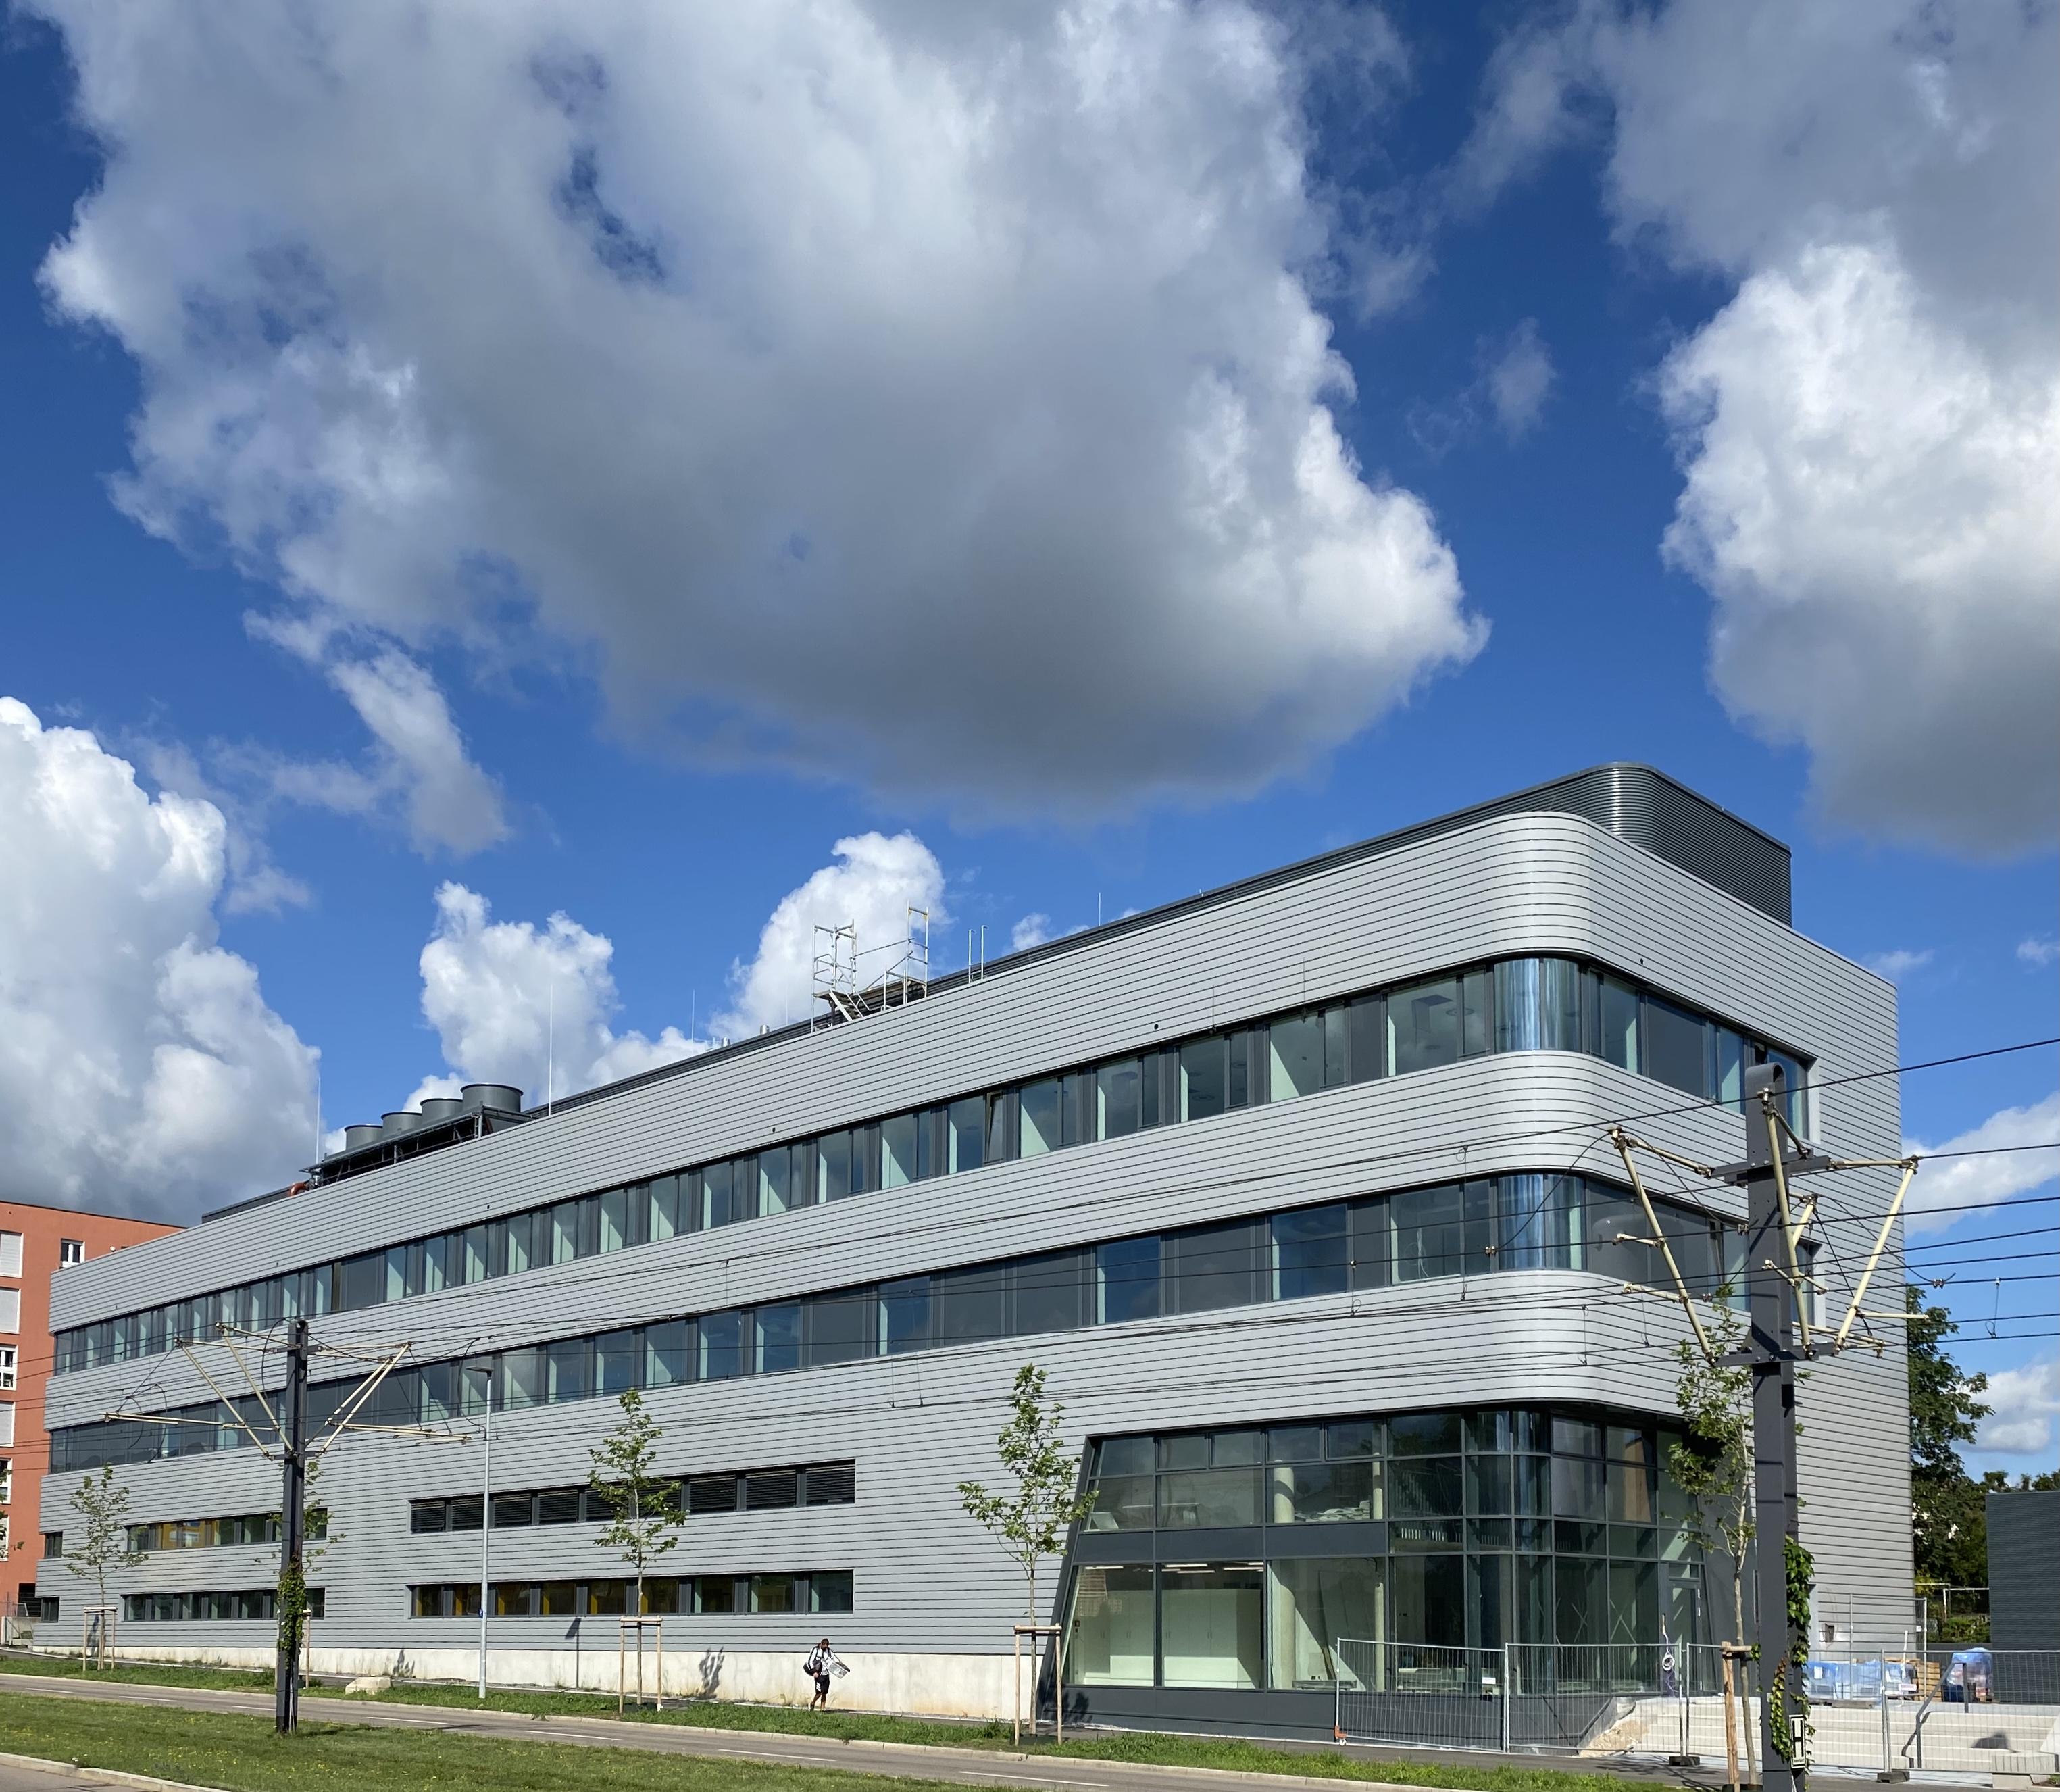 New Fraunhofer ISE Building